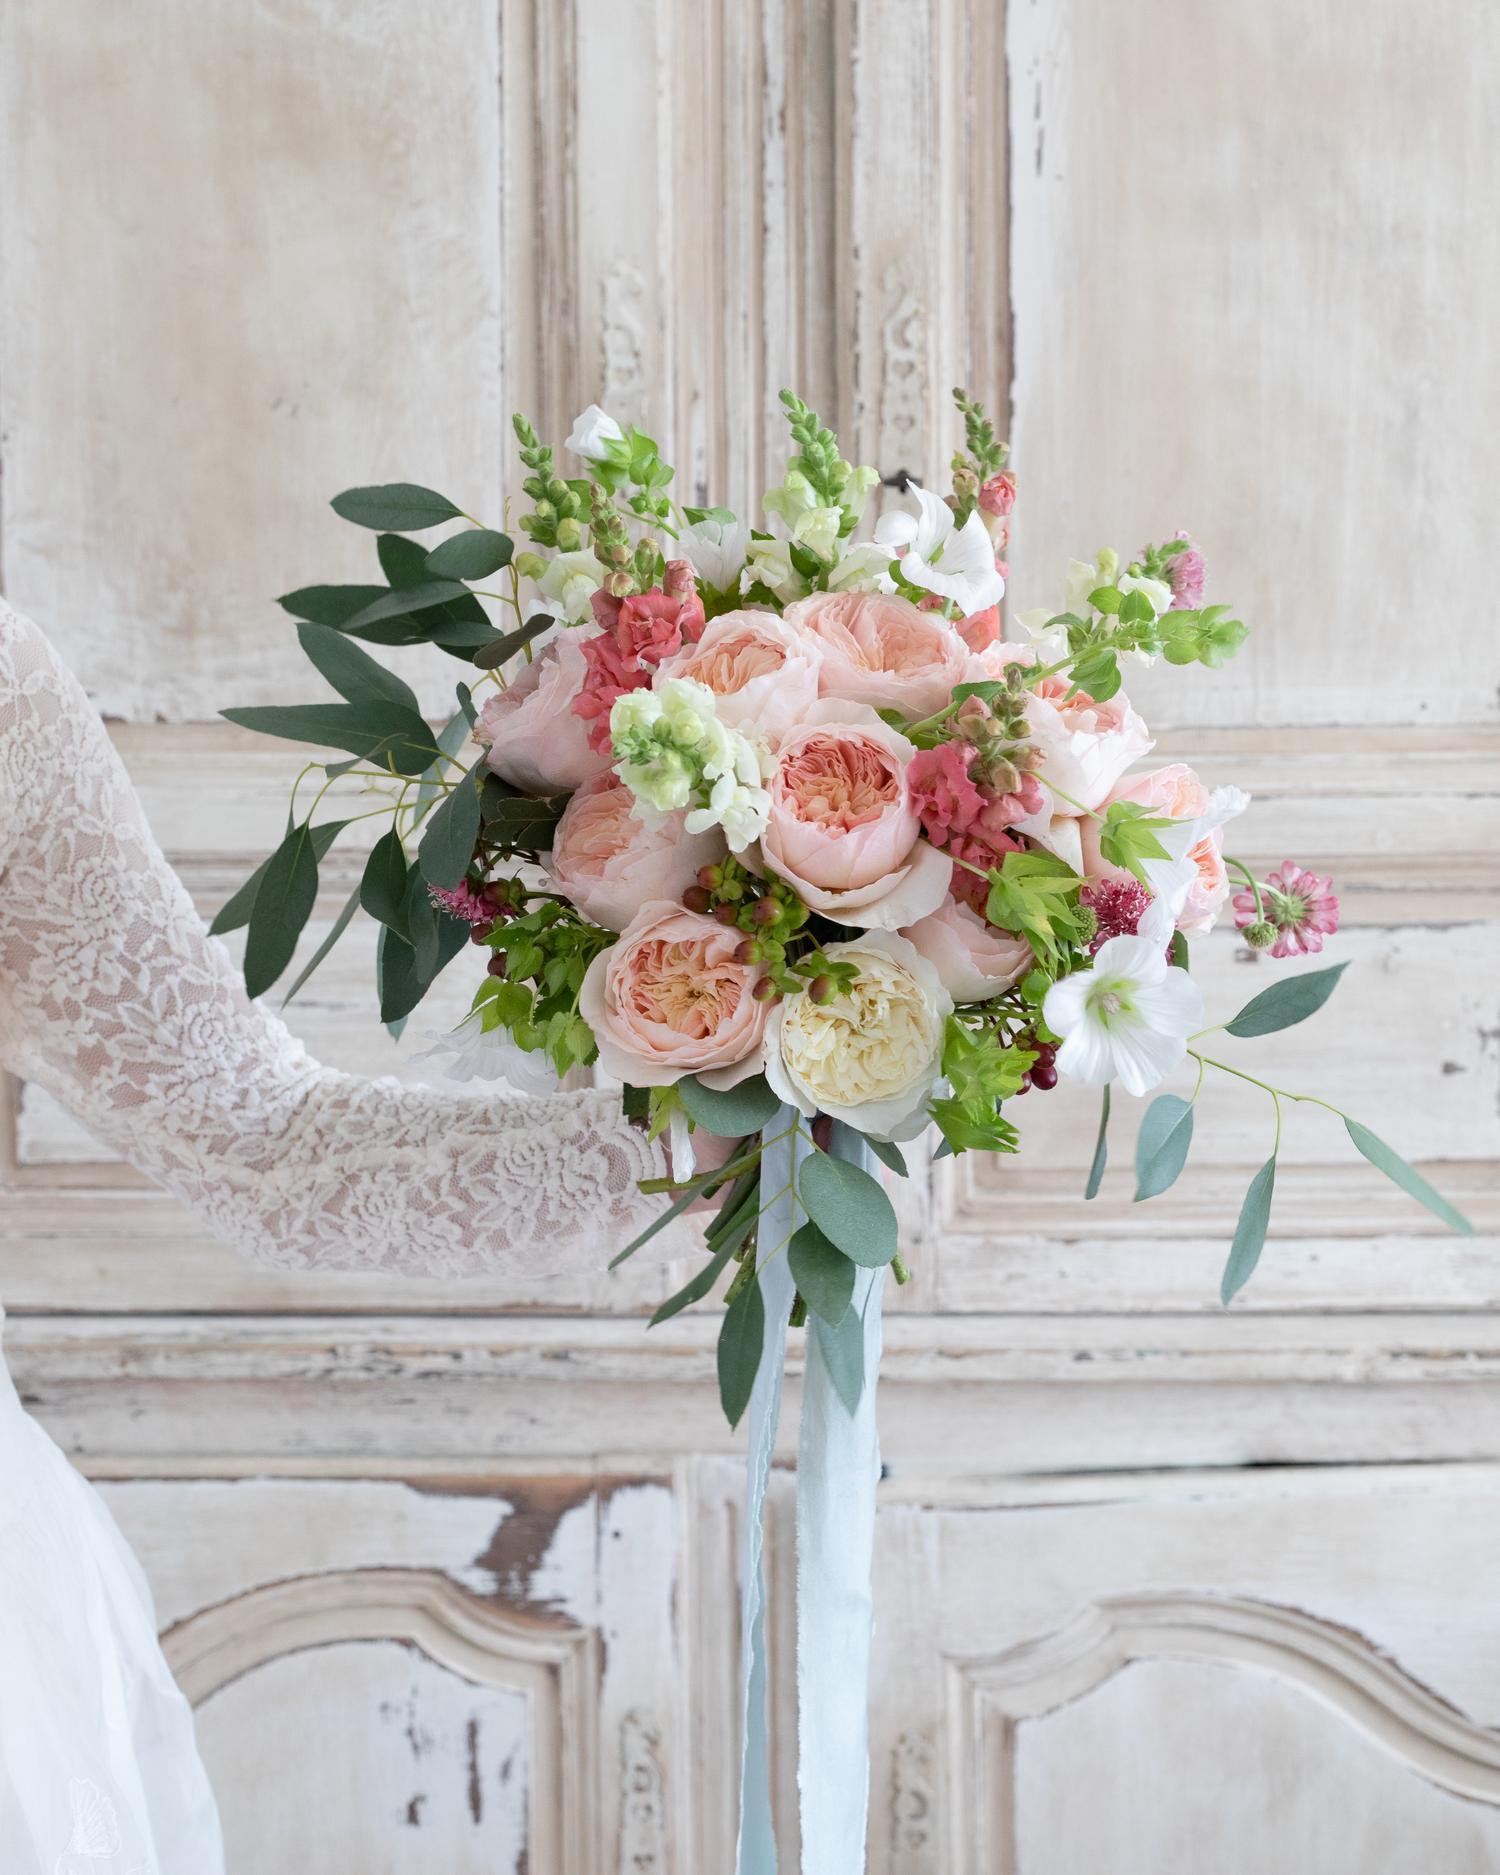 Juliet and Patience Wedding Bouquet